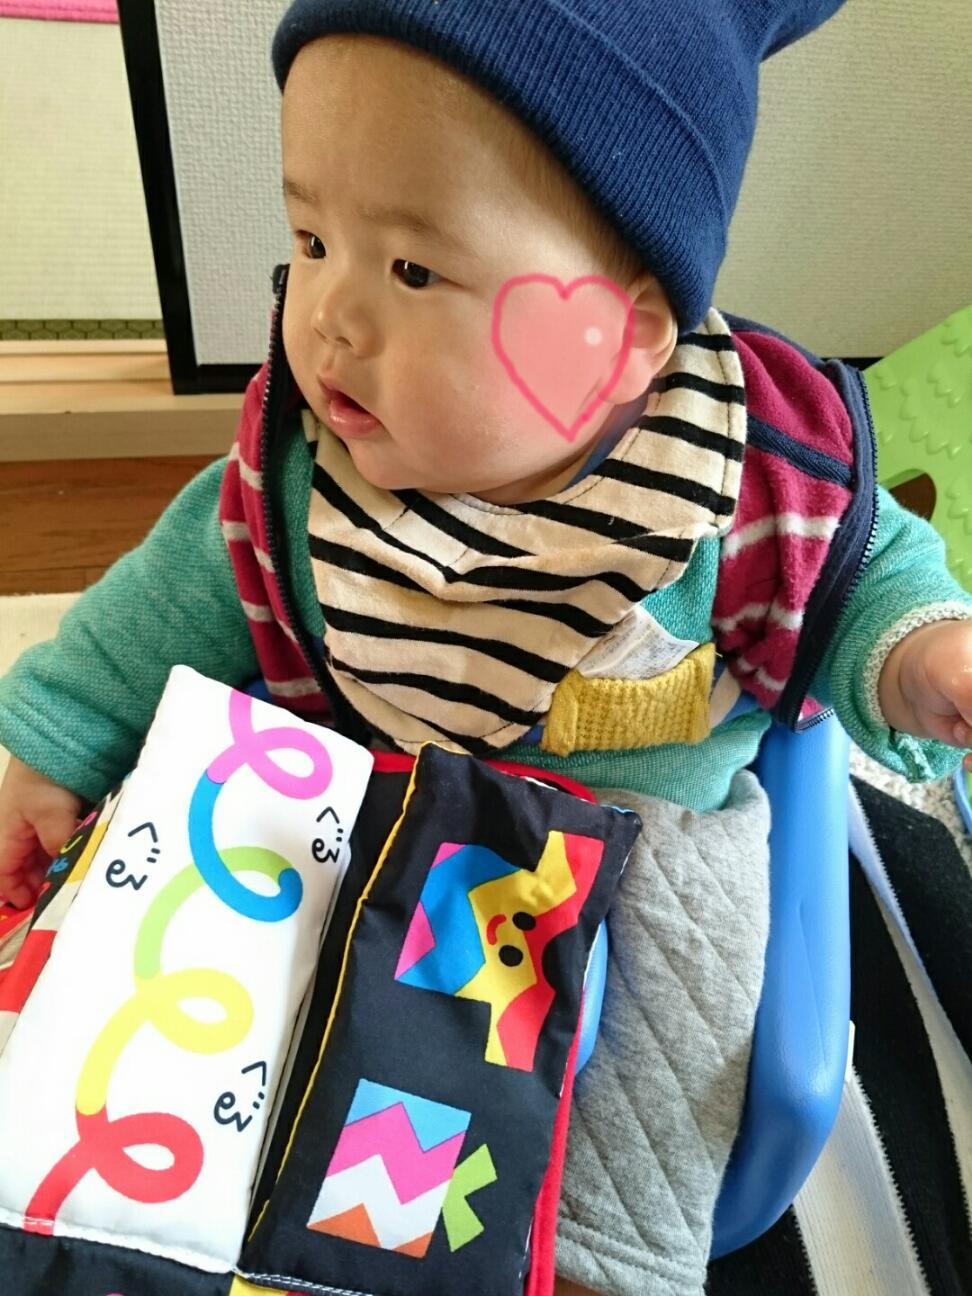 rakugaki_20151226135427560_zed20151226_135806_90p.jpg